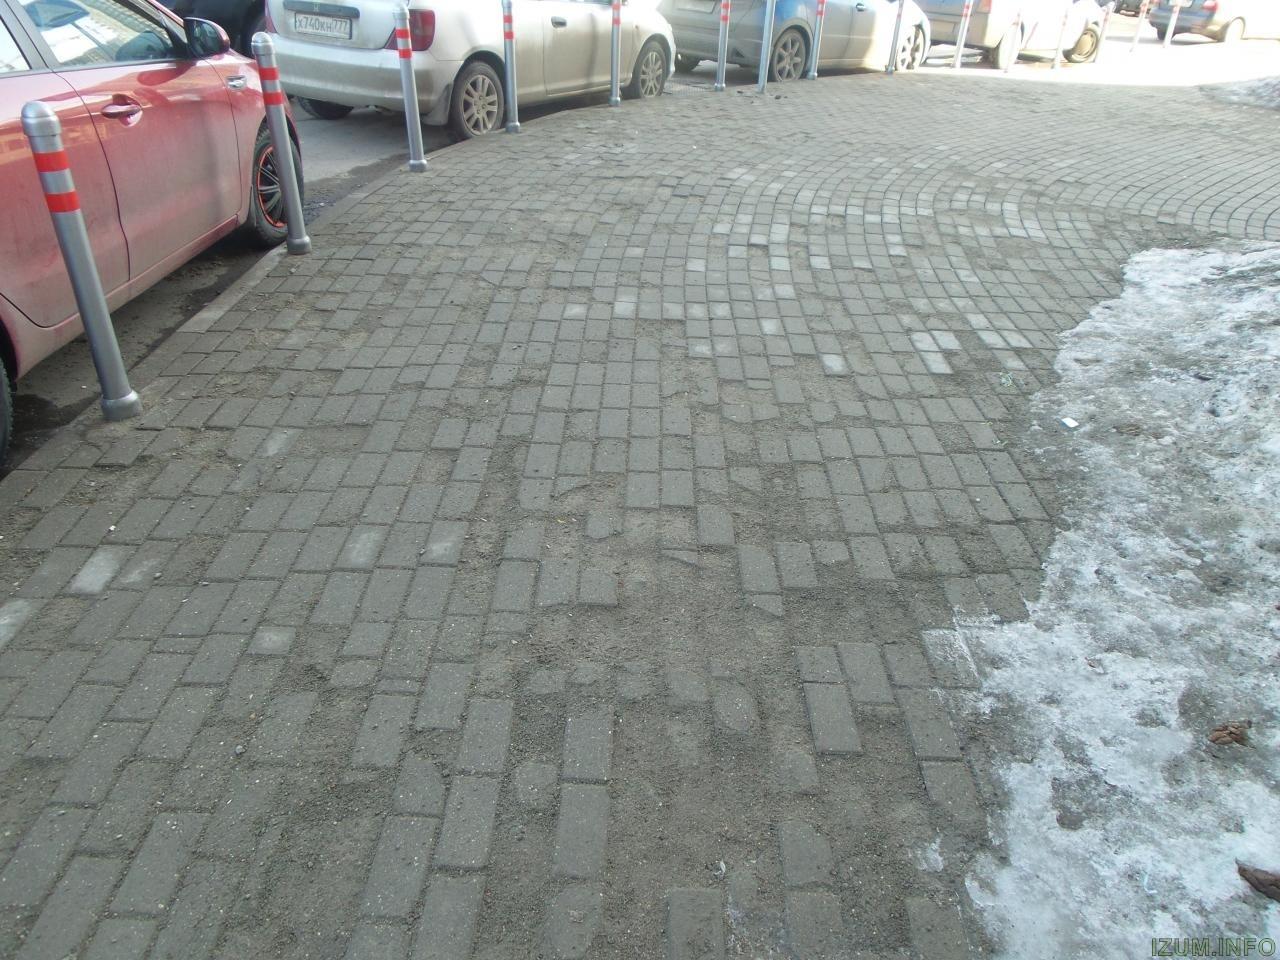 Тротуары ЖК Изумрудные холмы izum (5).jpg